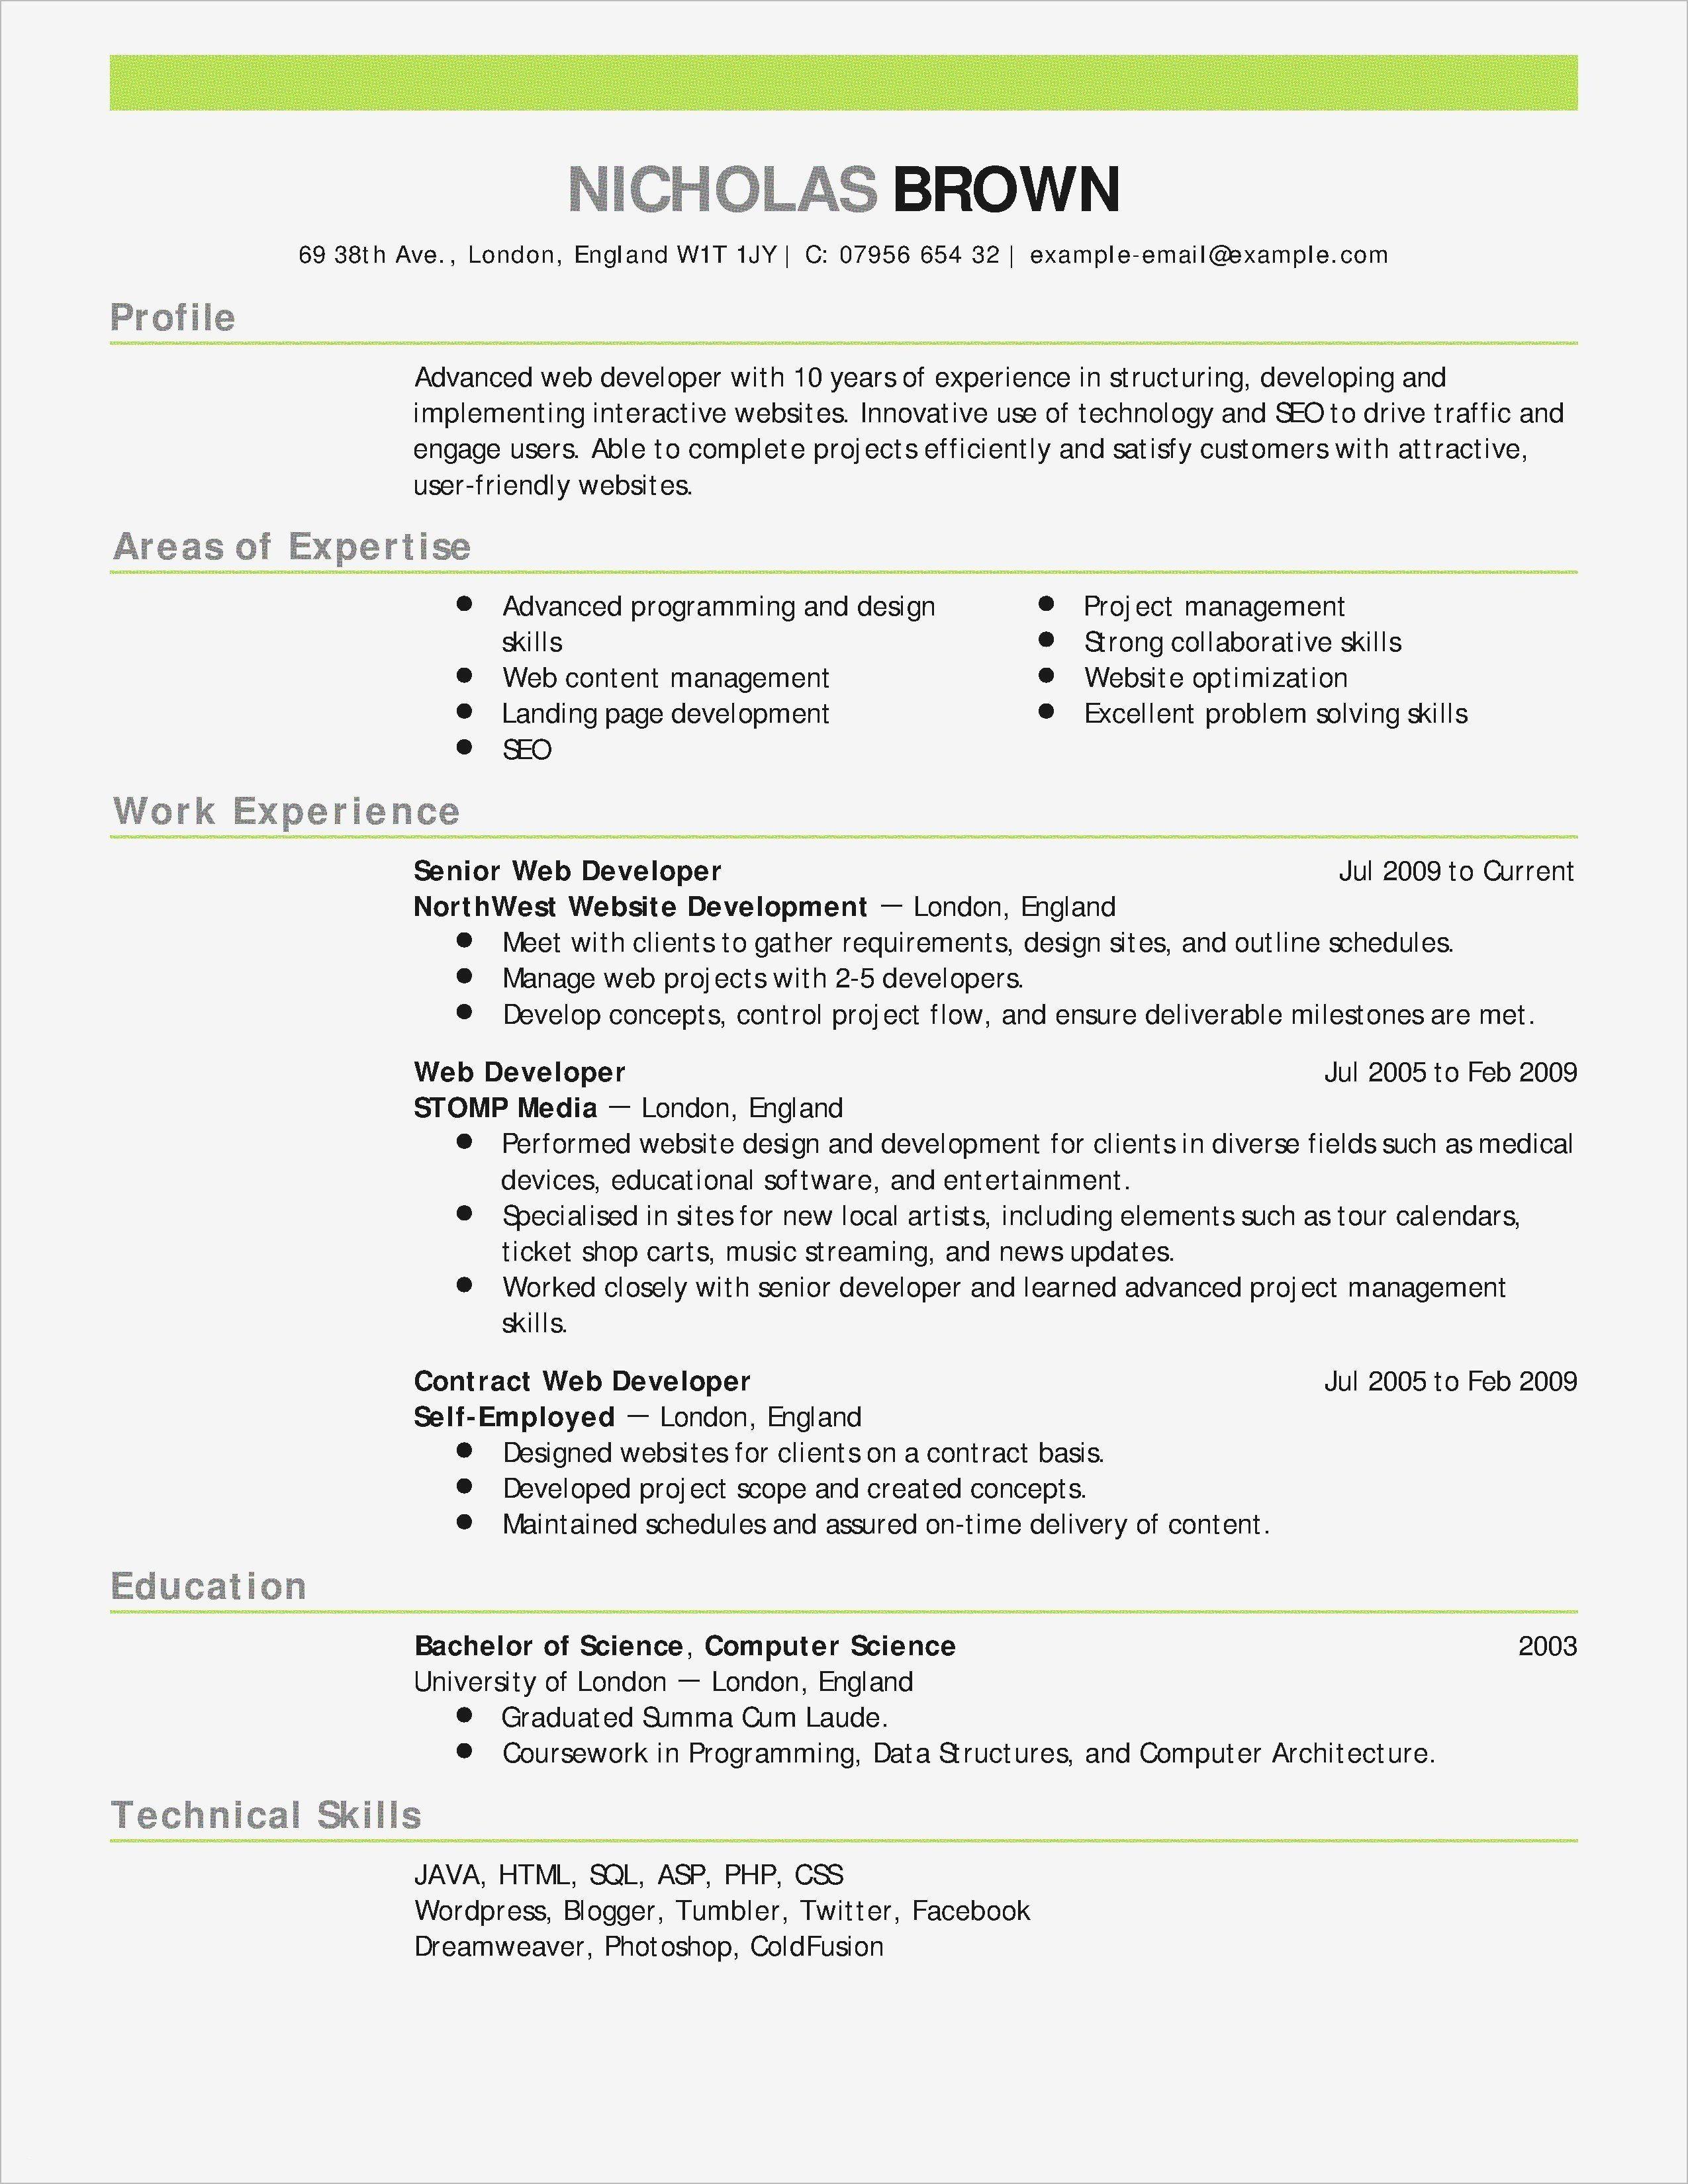 Vba On Error Resume Next Awesome Jscribes Resume Builder